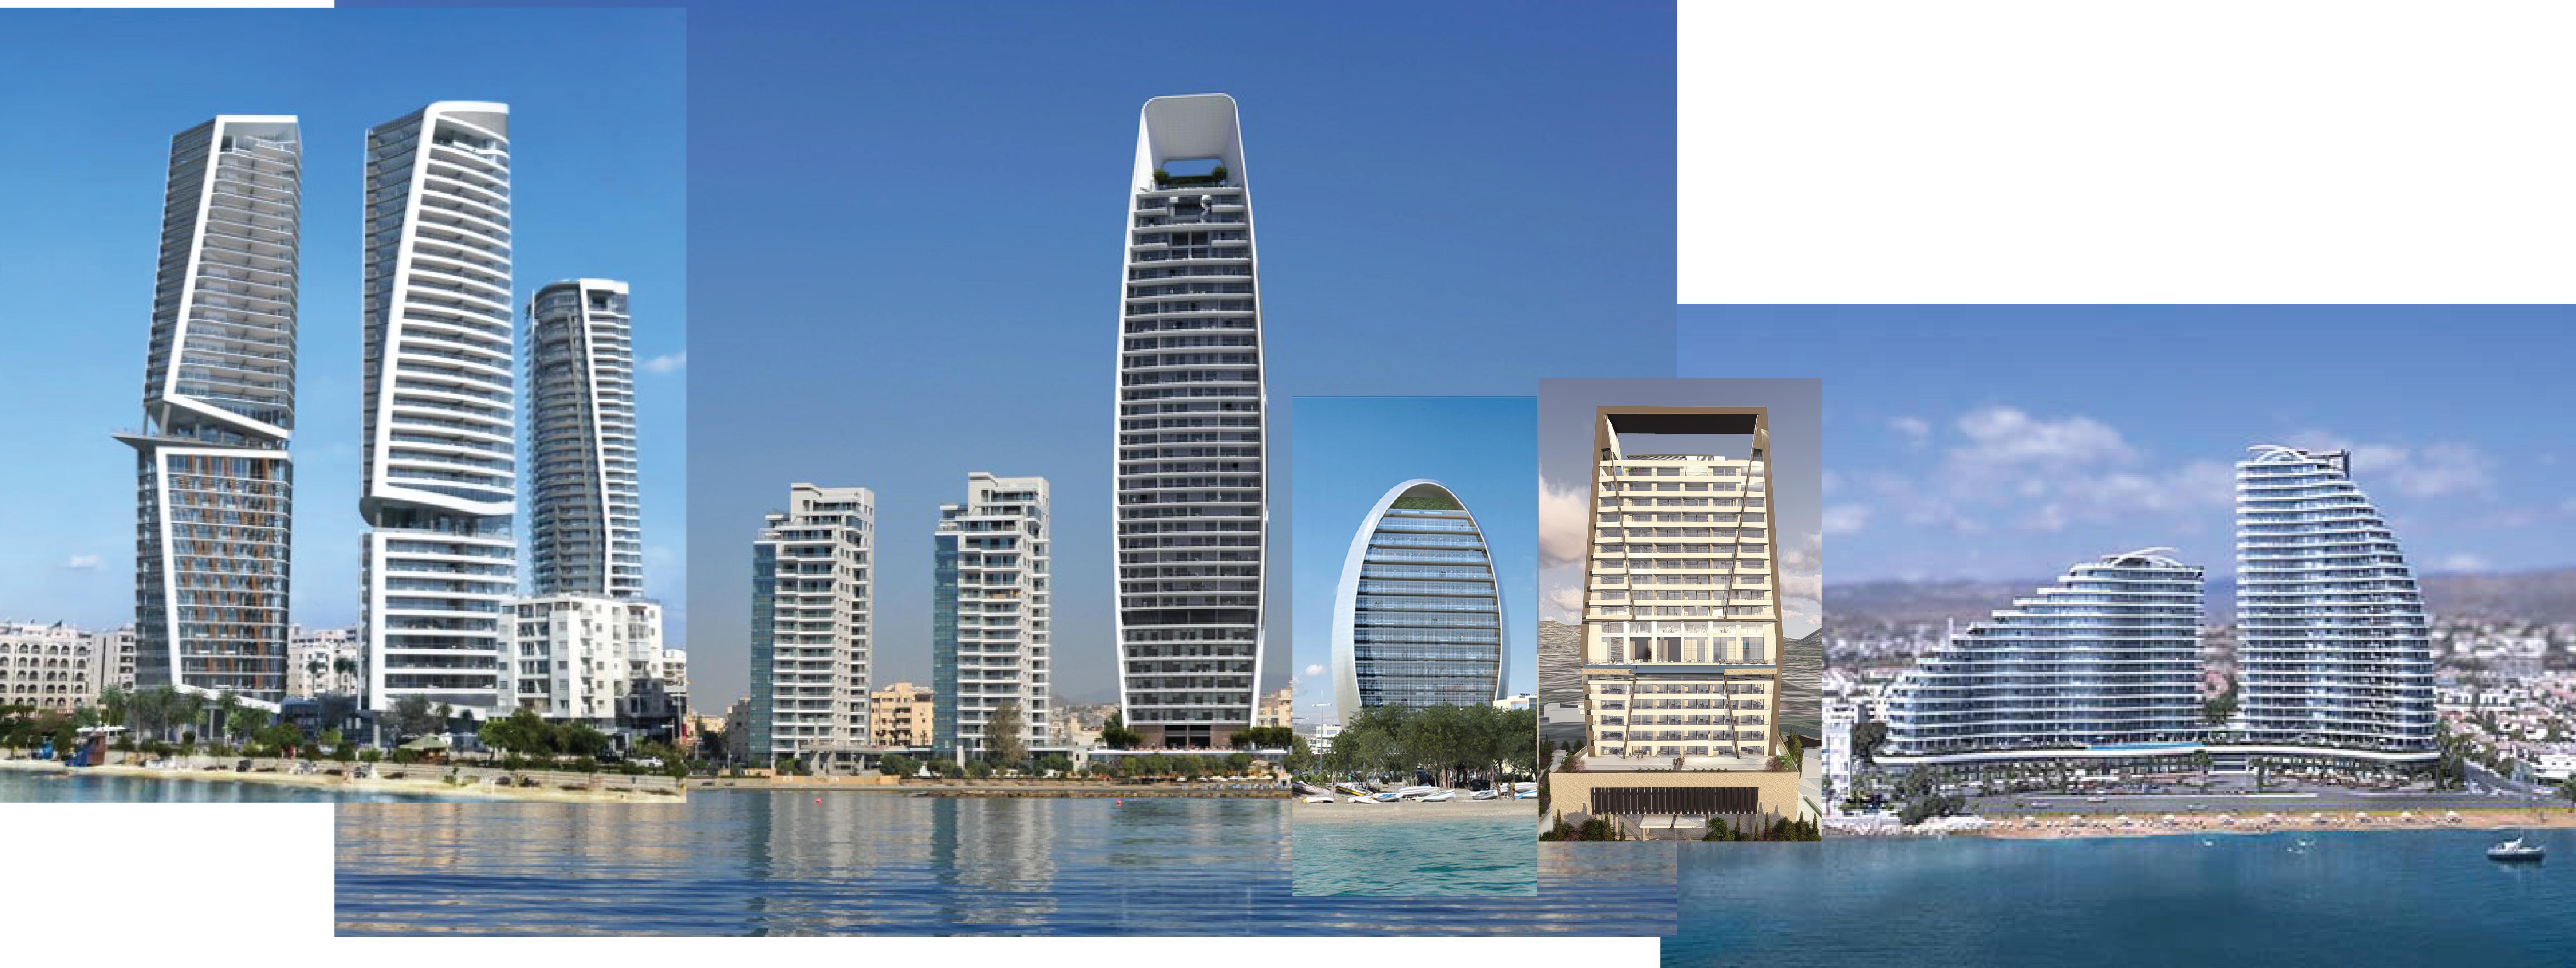 Skyline Building Services